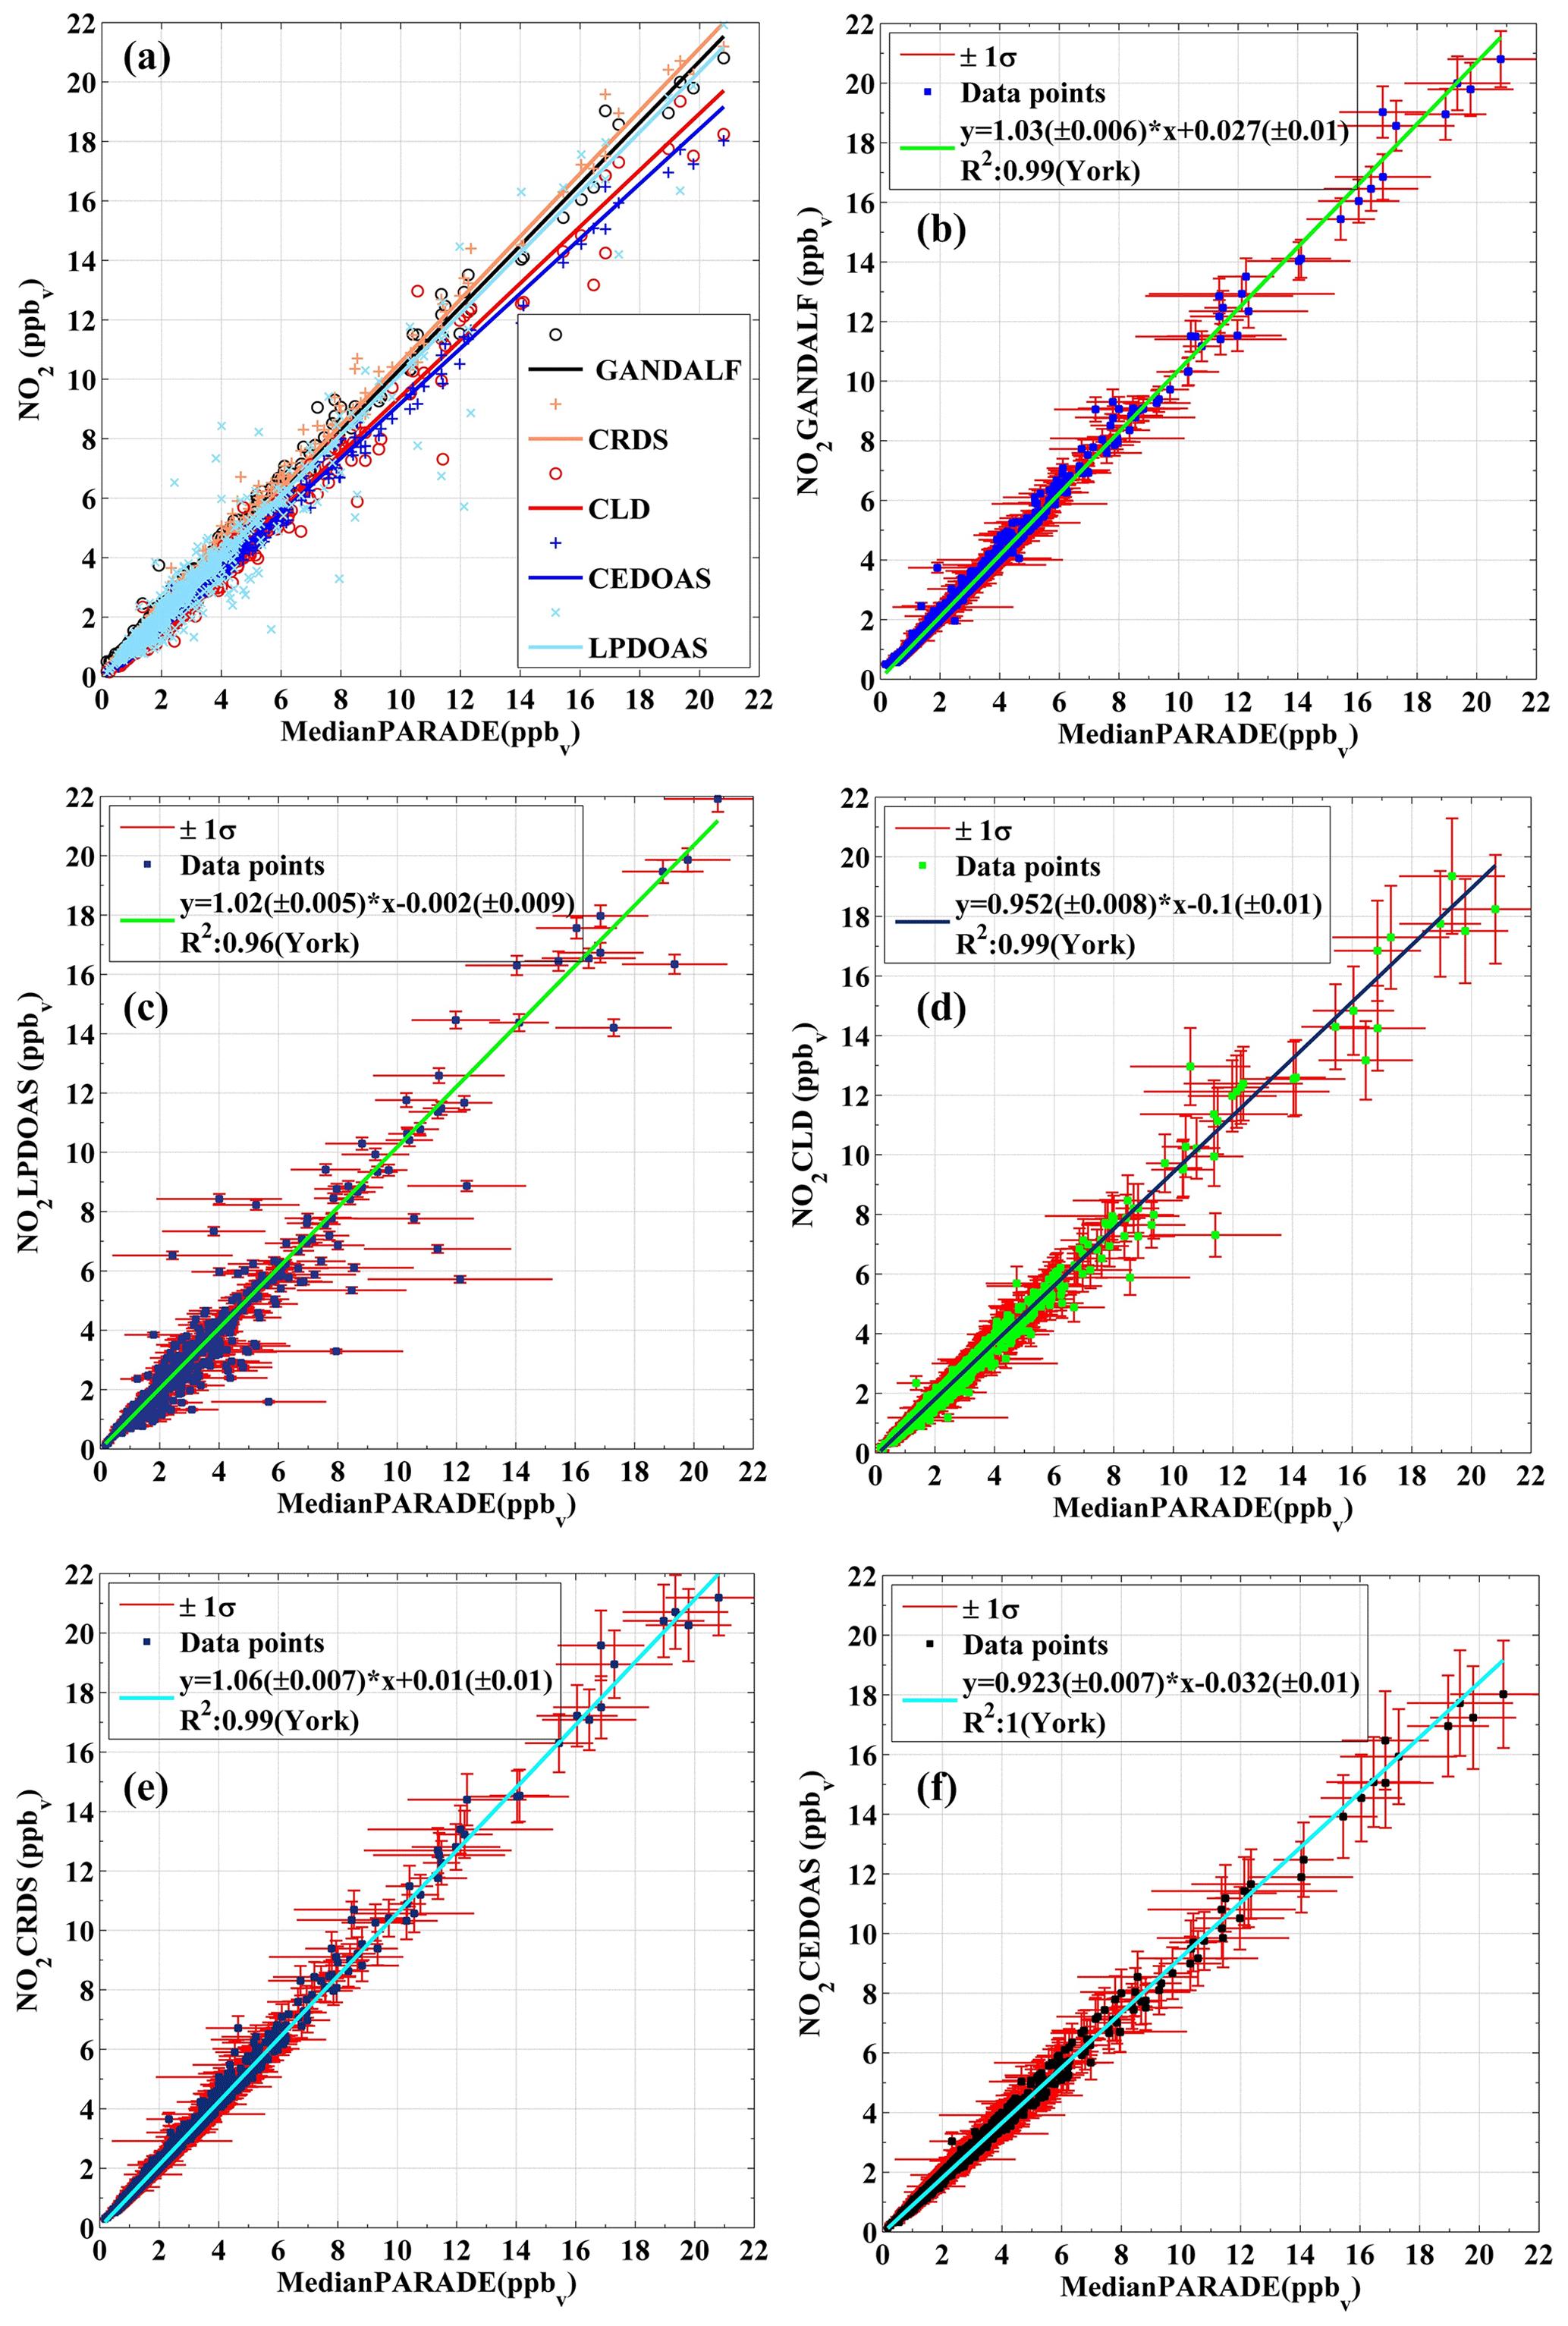 AMT - Laser-induced fluorescence-based detection of